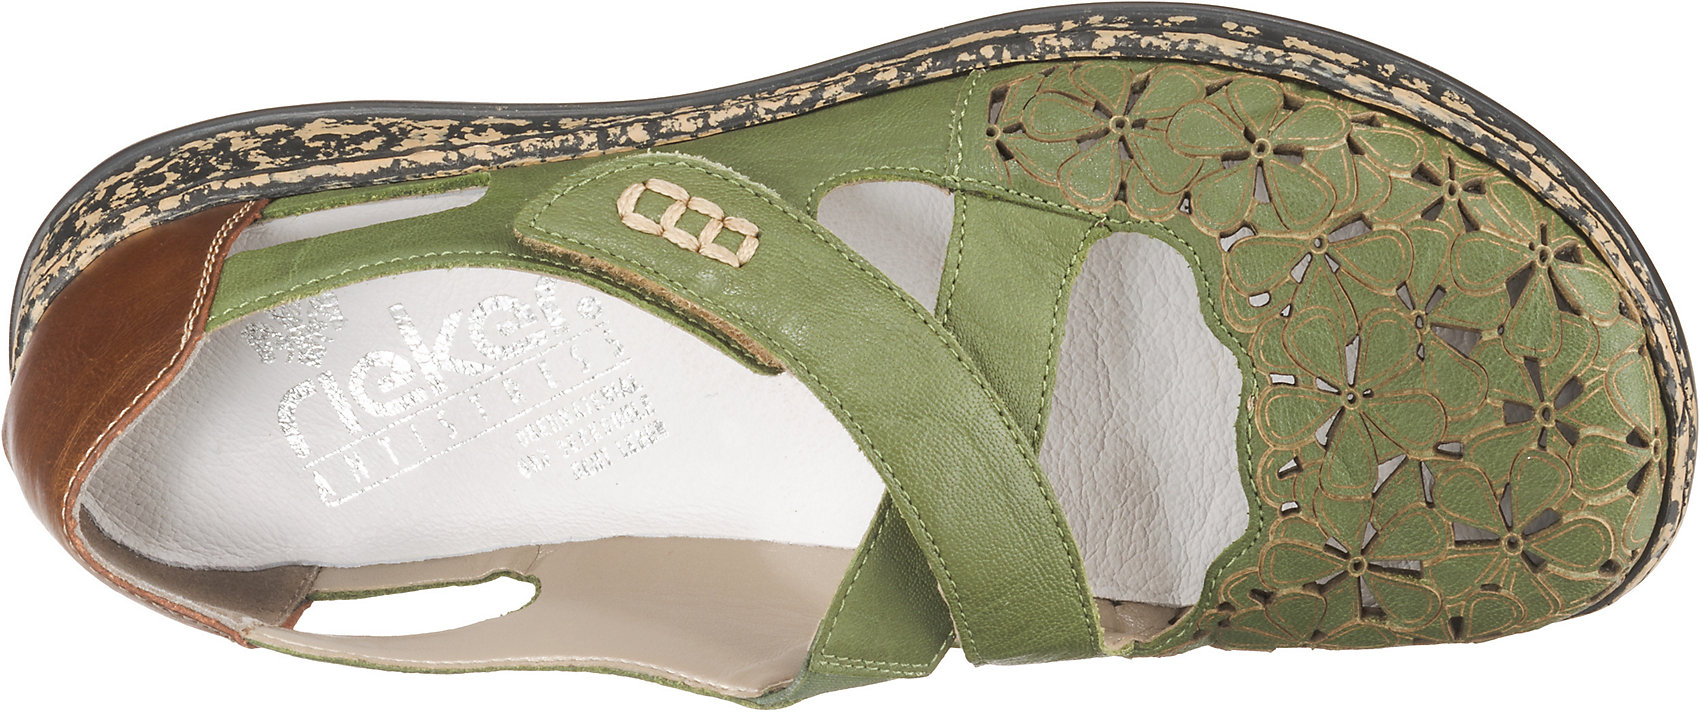 Neu rieker Ballerinas 10626003 für Damen grün blau-kombi